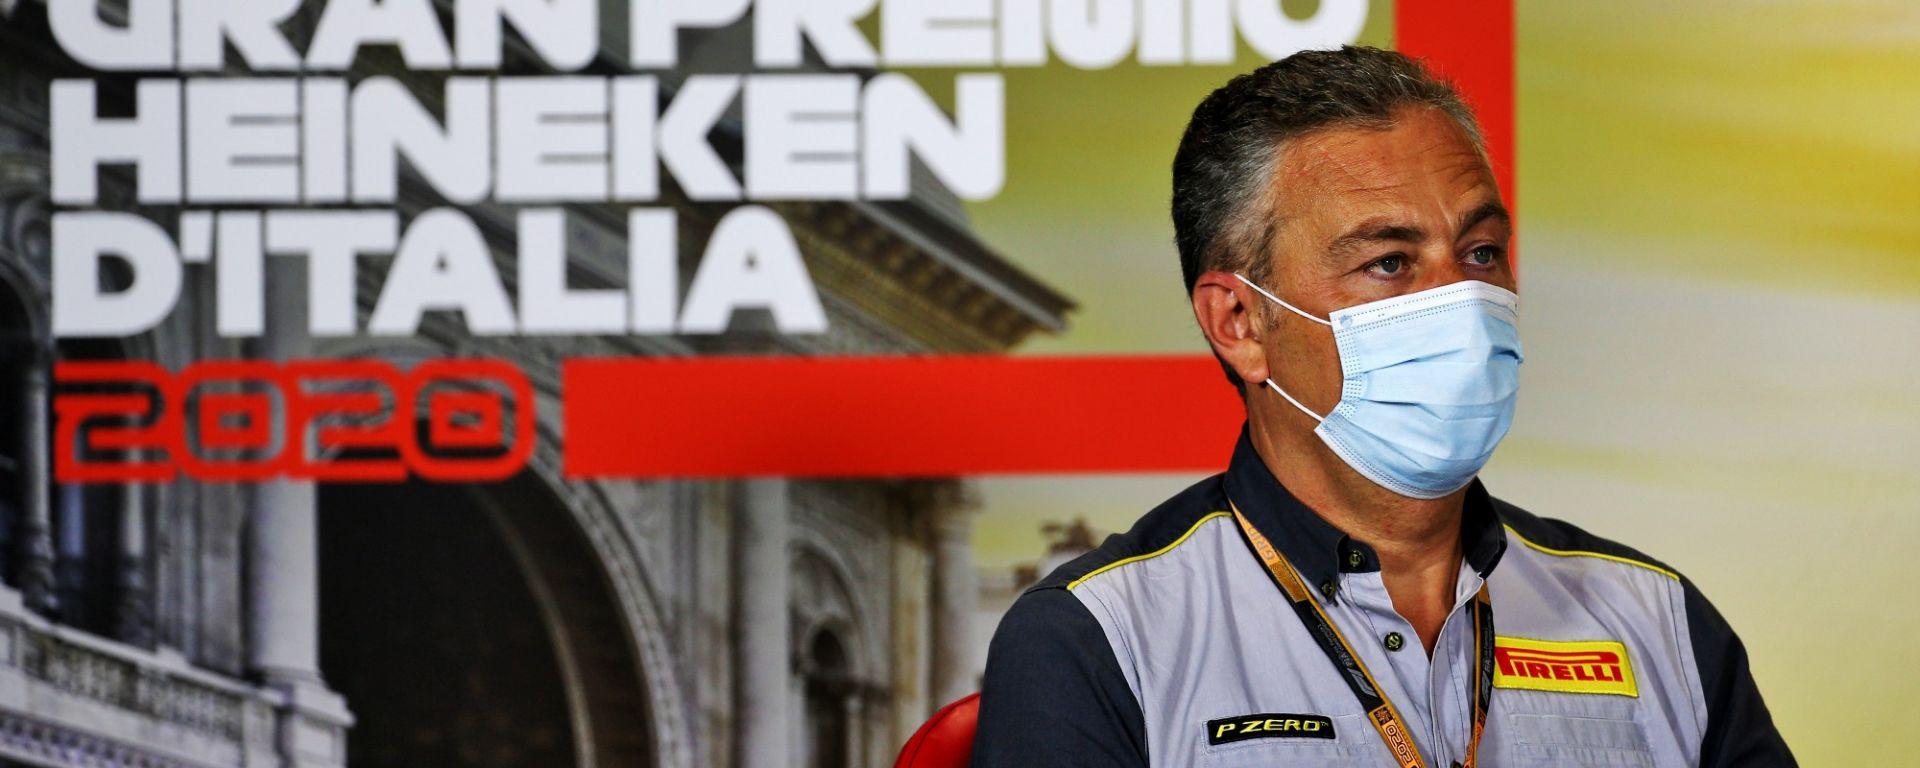 GP Italia 2020, Monza: Mario Isola (Pirelli)